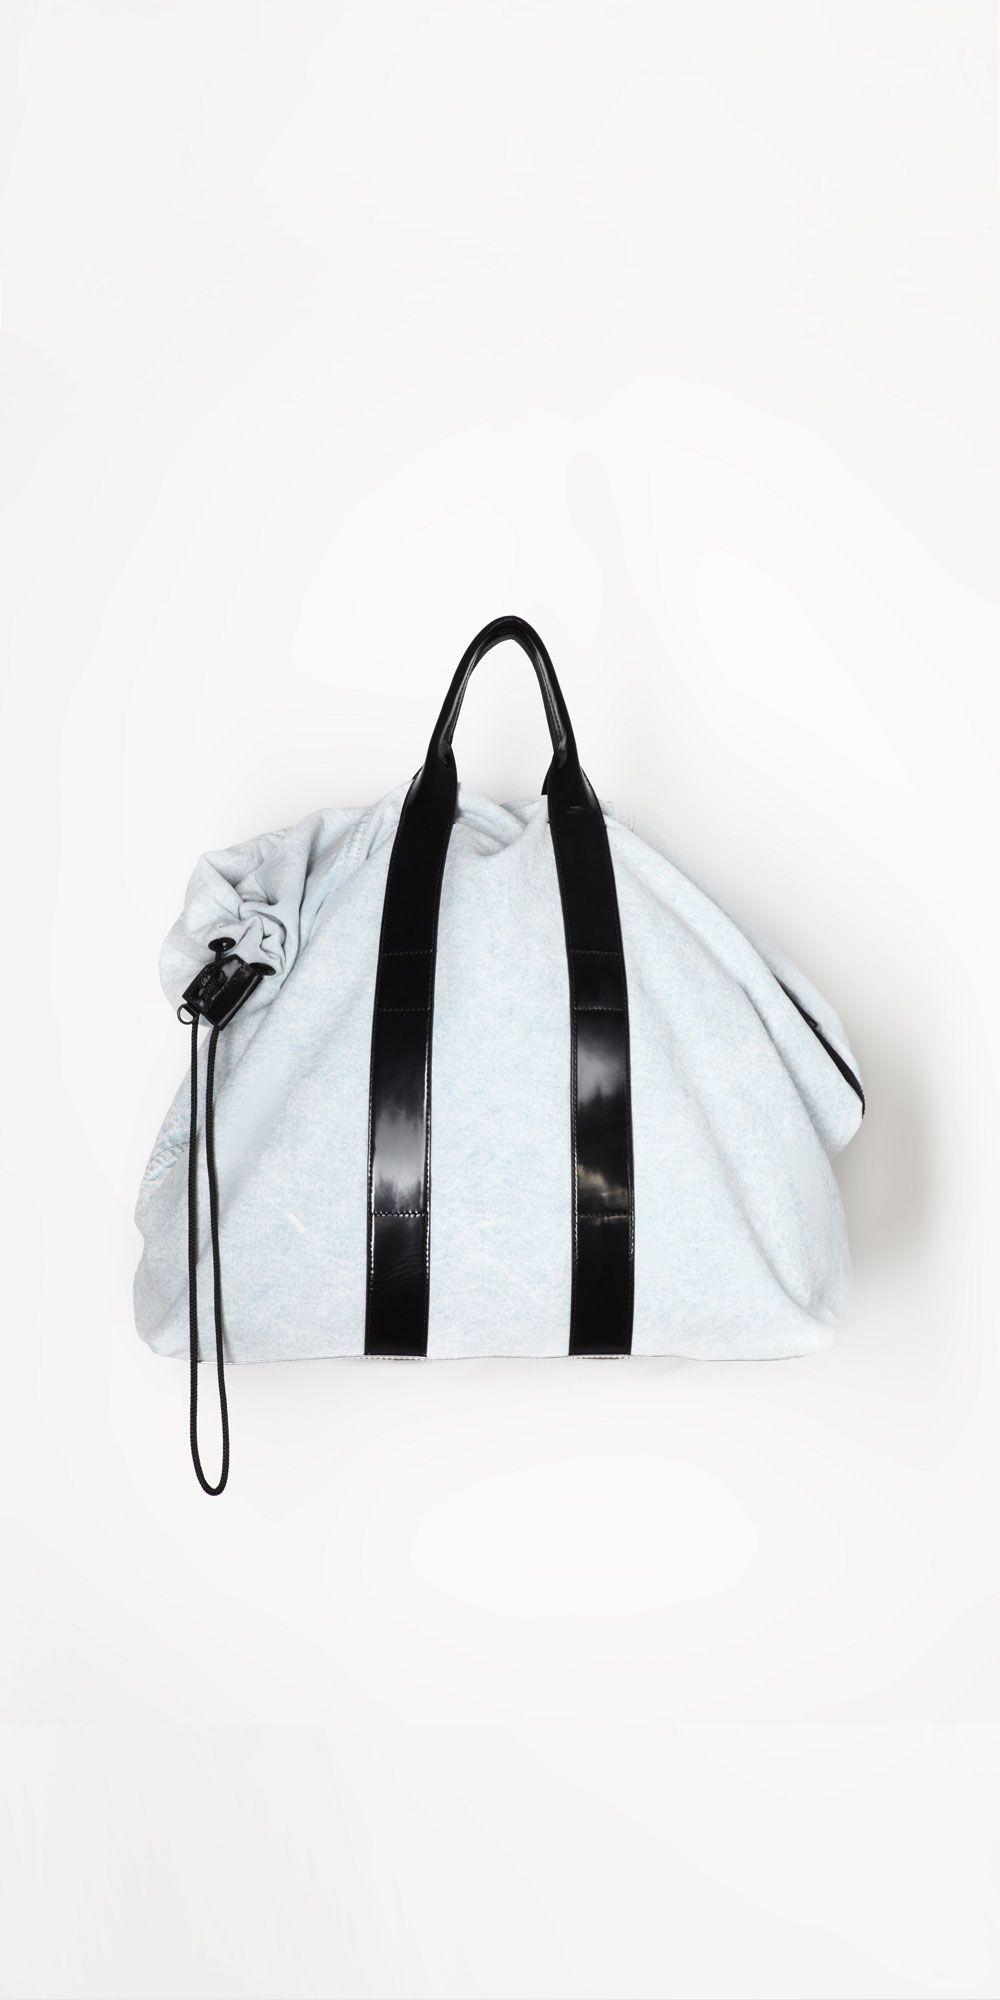 6c73e503fa9 31philliplim my ideal sports bag.   Speechless styles   Pinterest ...